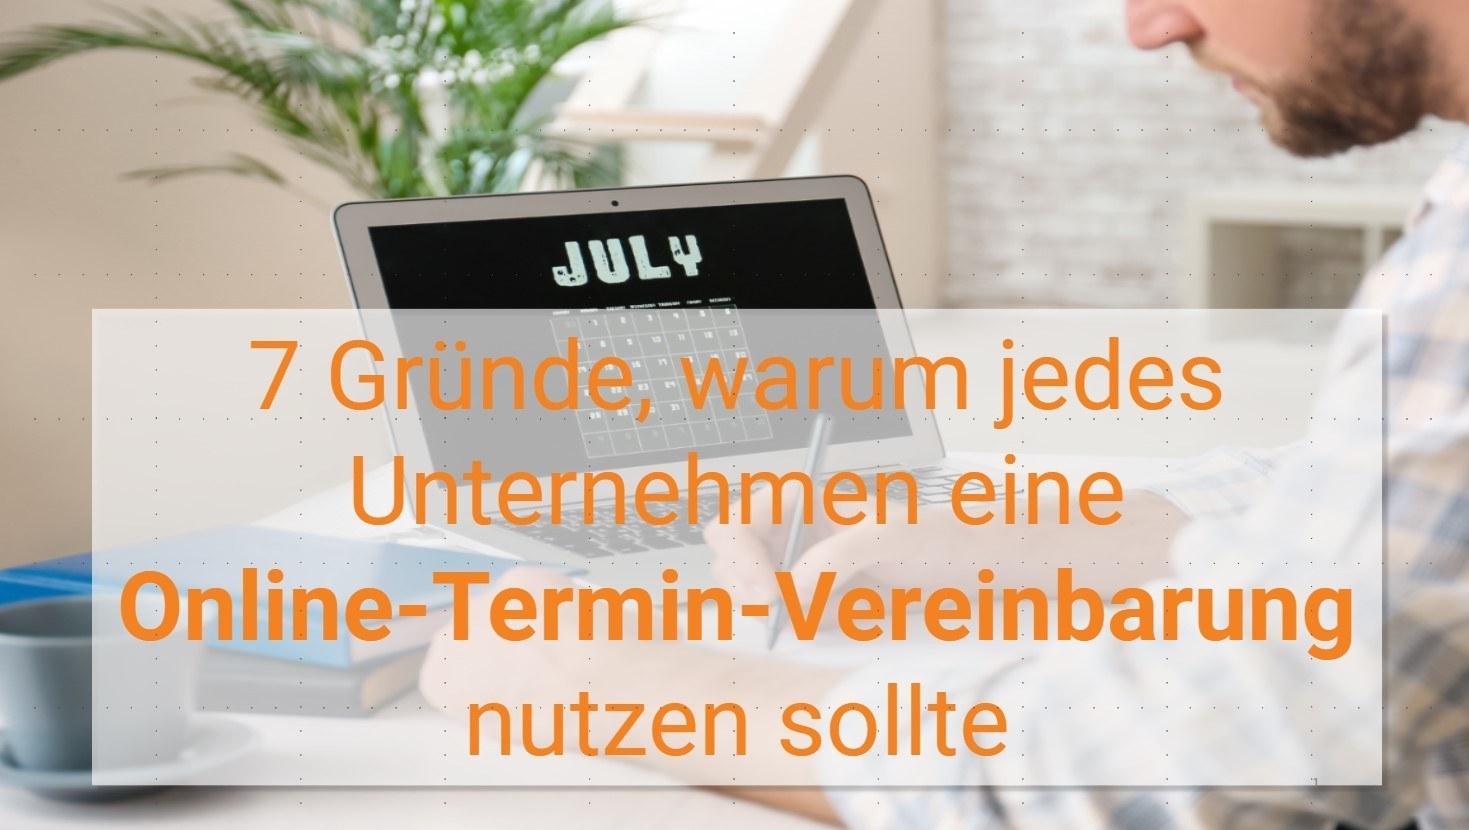 Webinar - Online Termin Vereinbarung